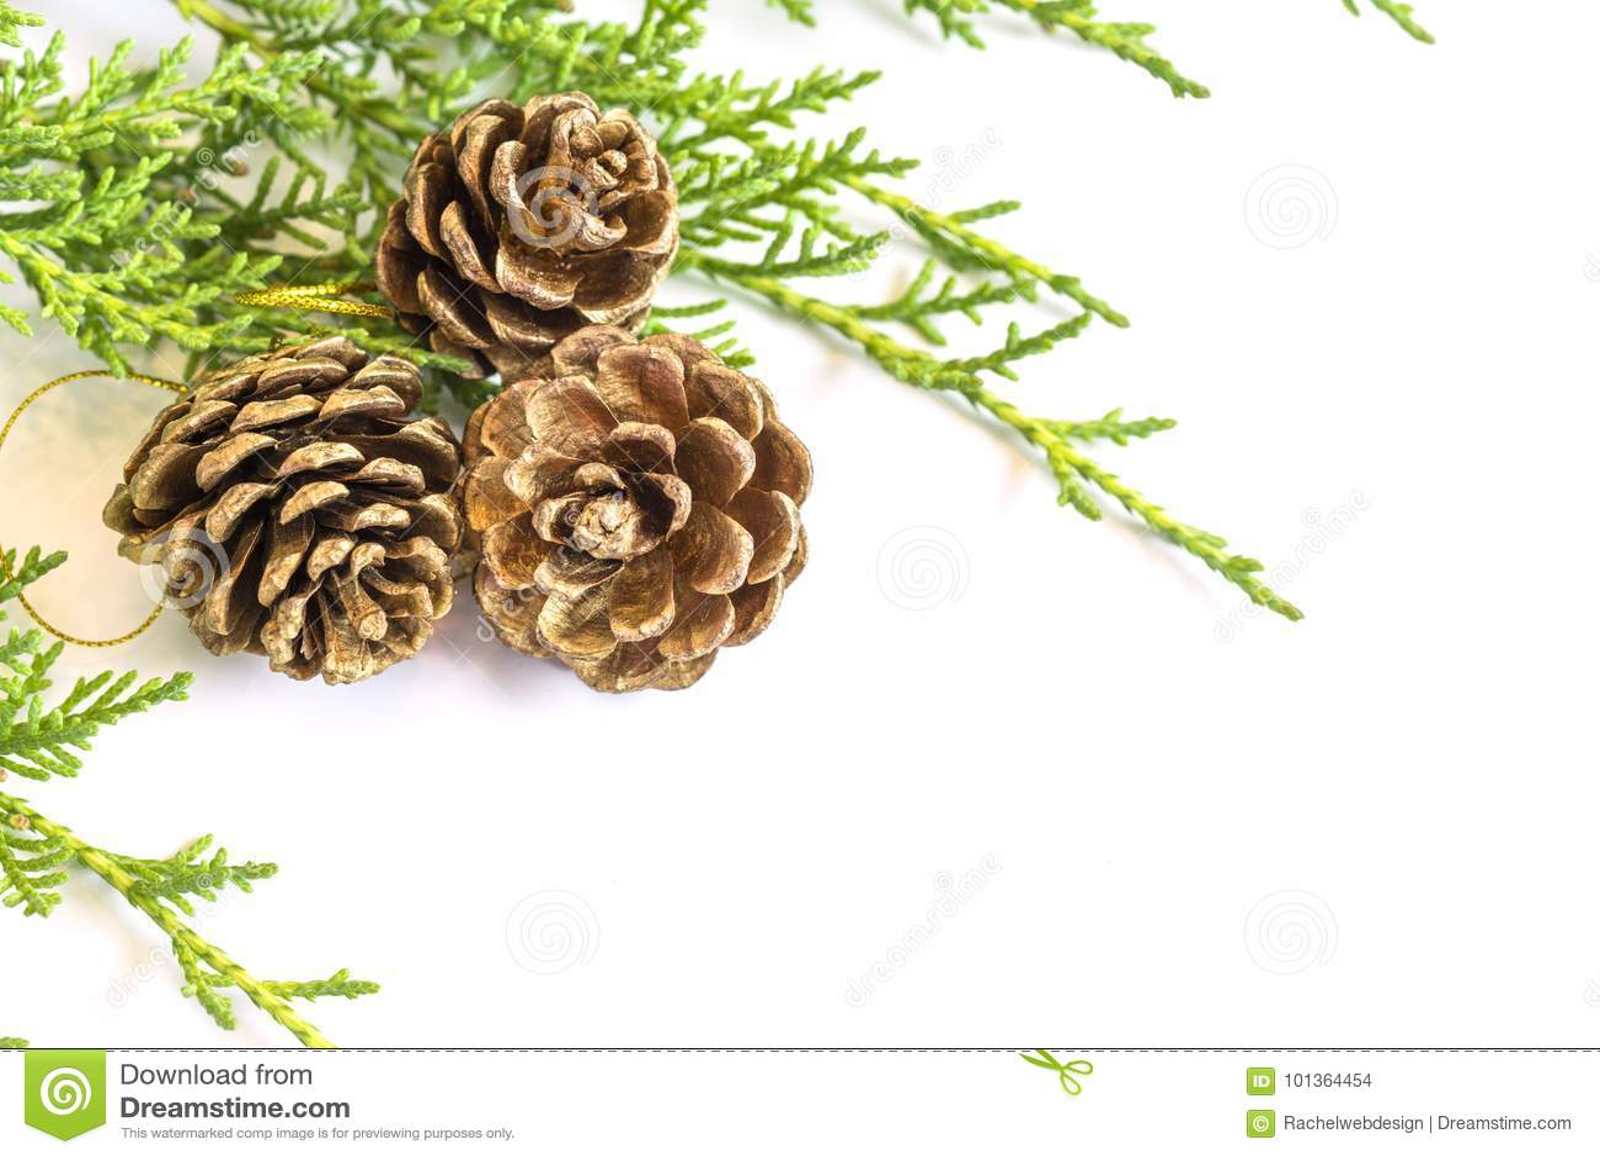 closeup of three golden pine cone decorations and pine tree bran